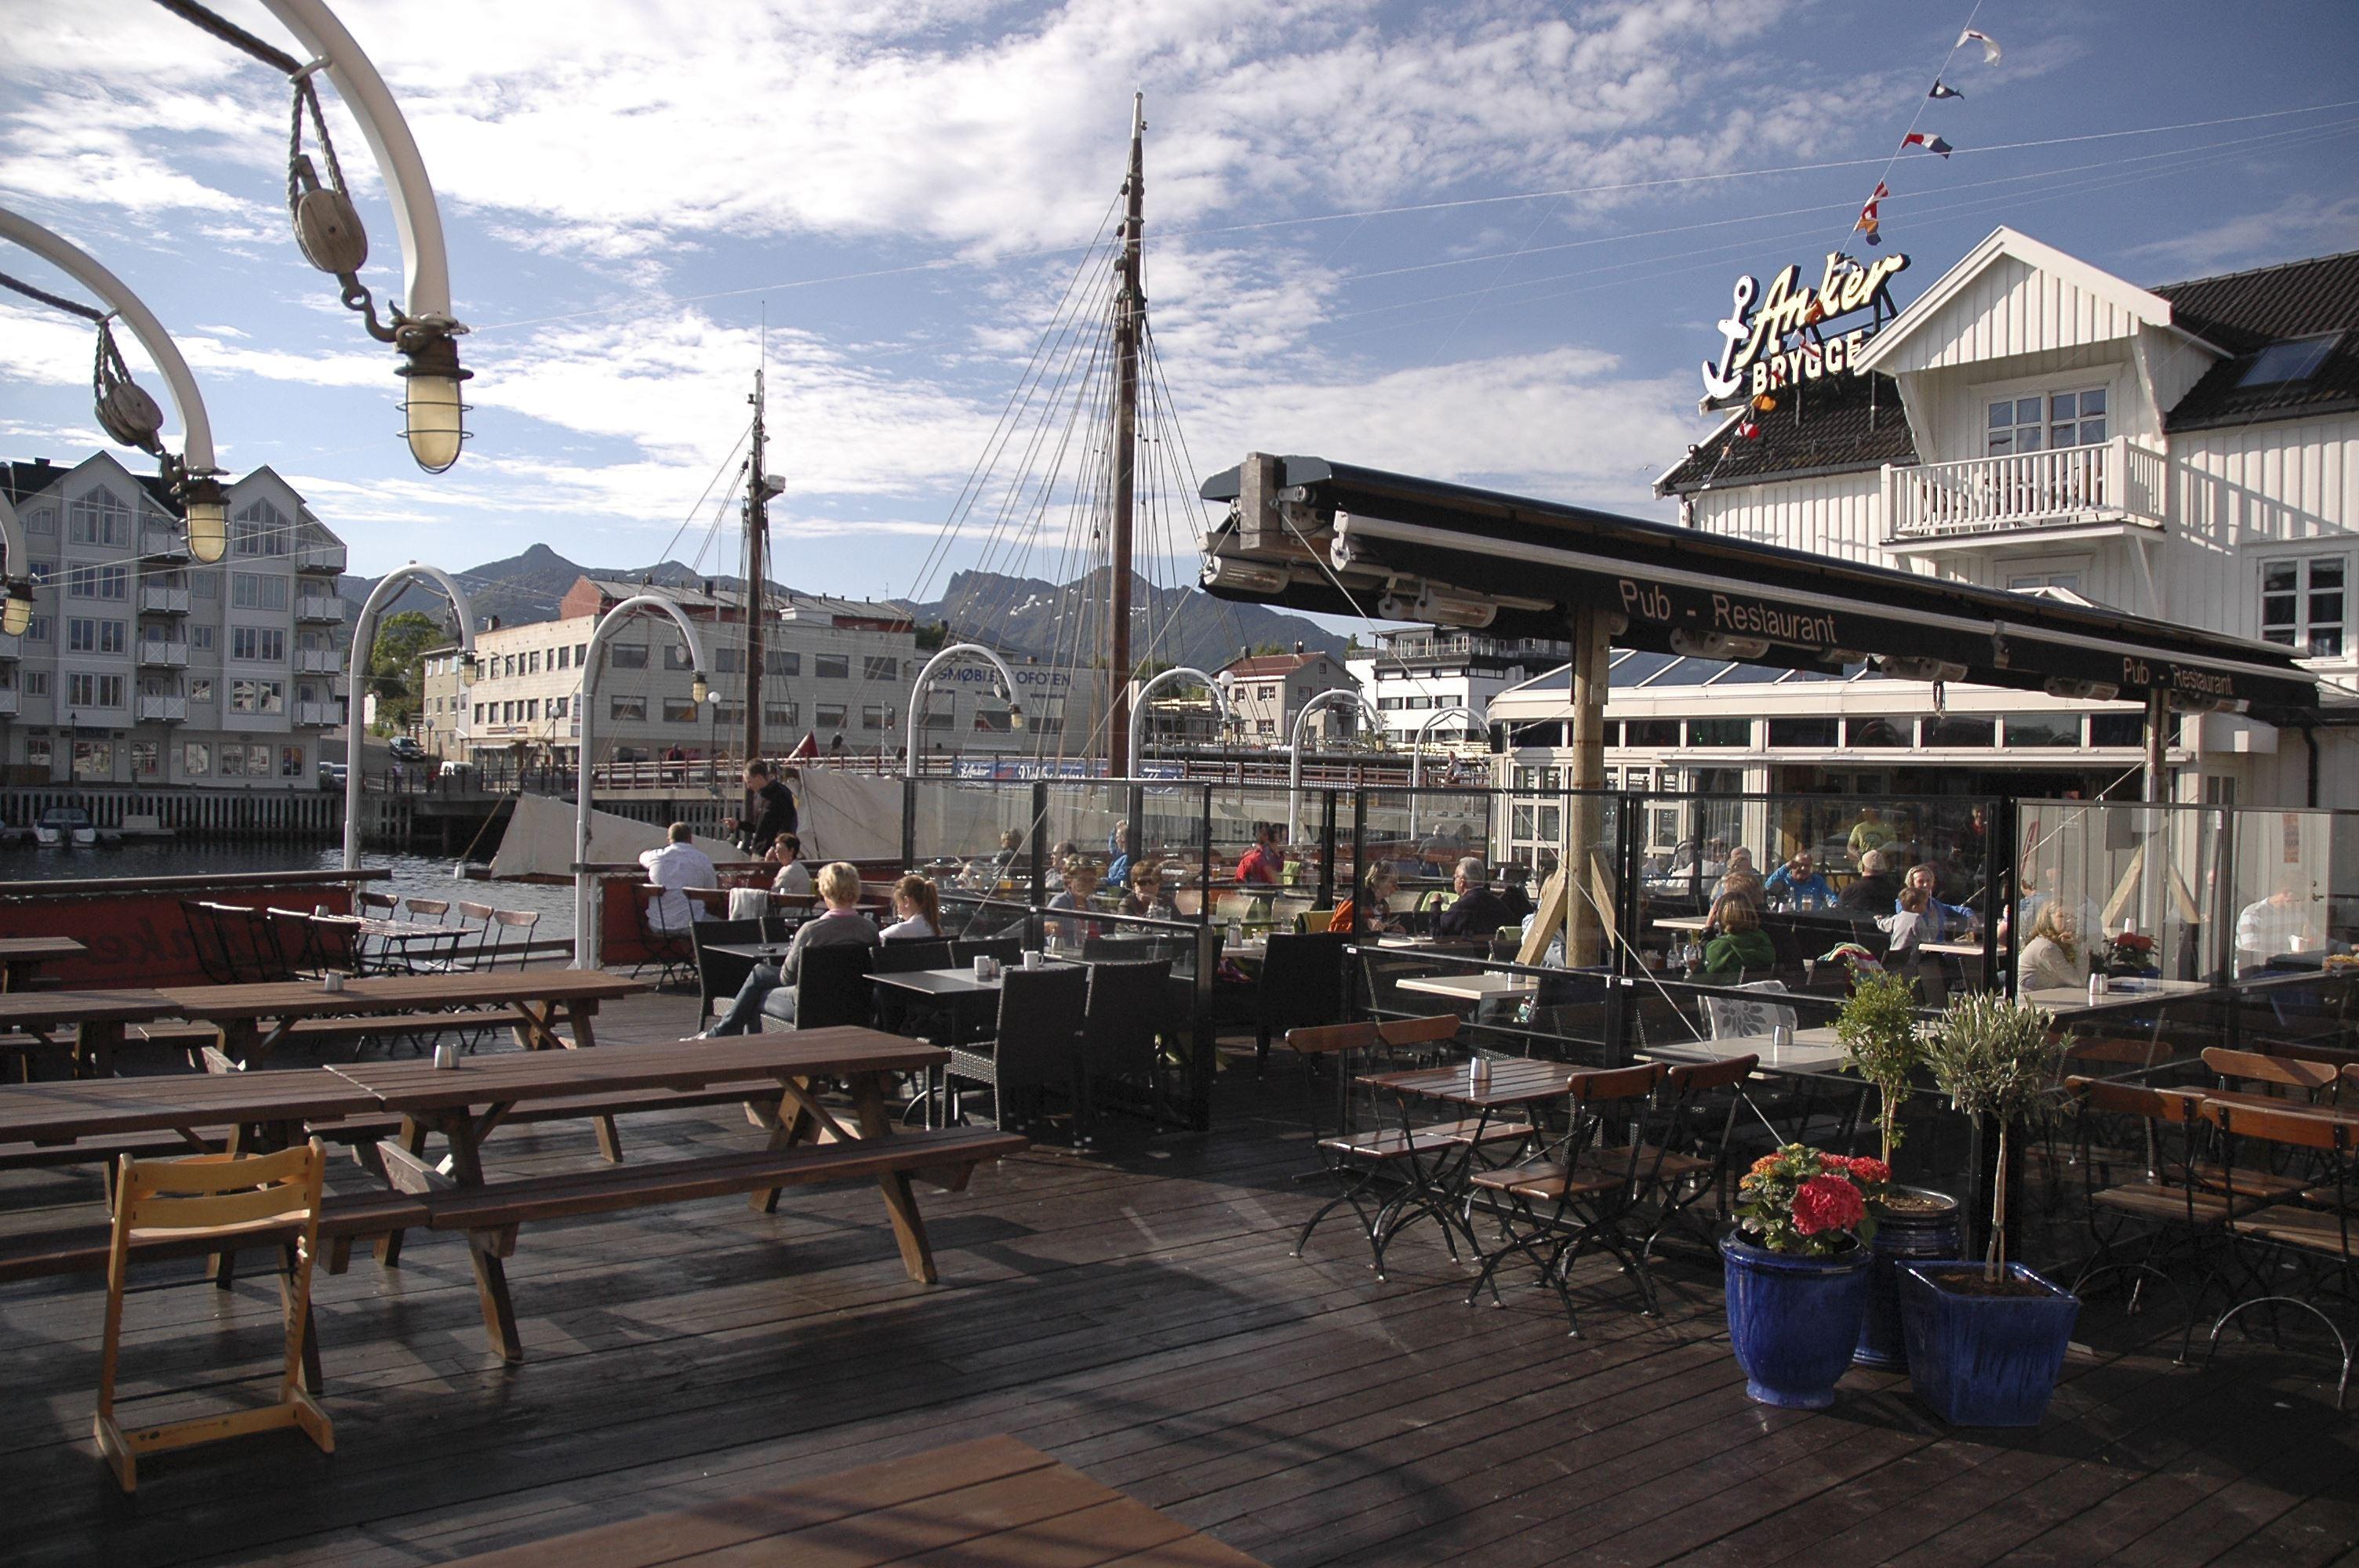 © Anker Brygge, Bryggebaren pub